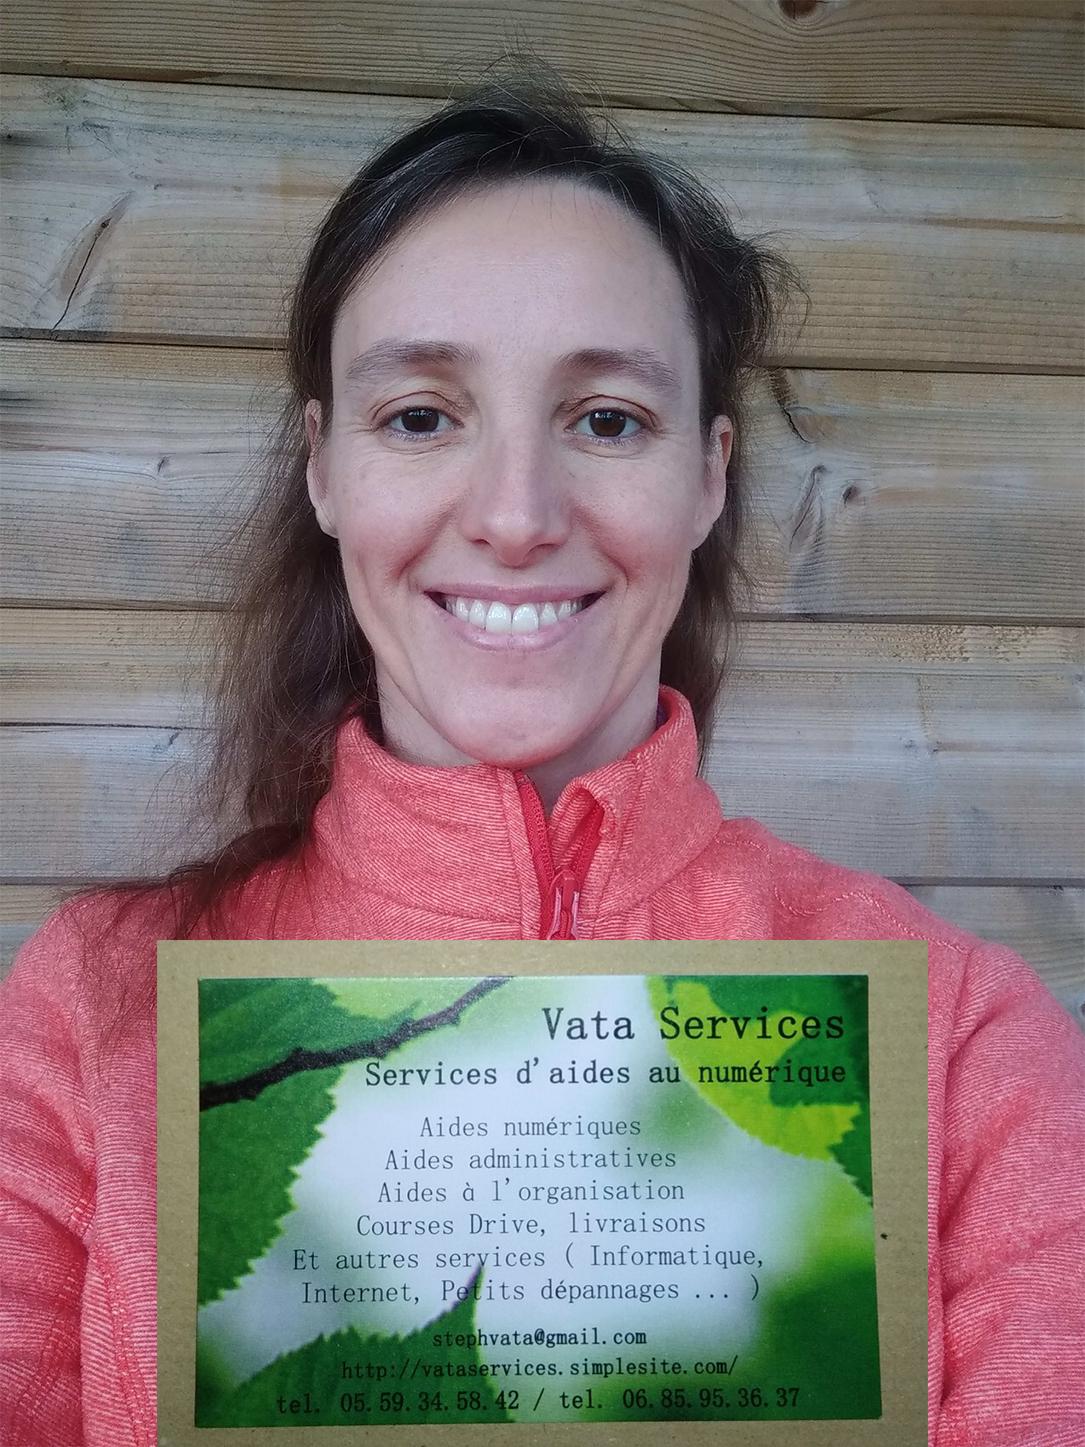 VATA Services